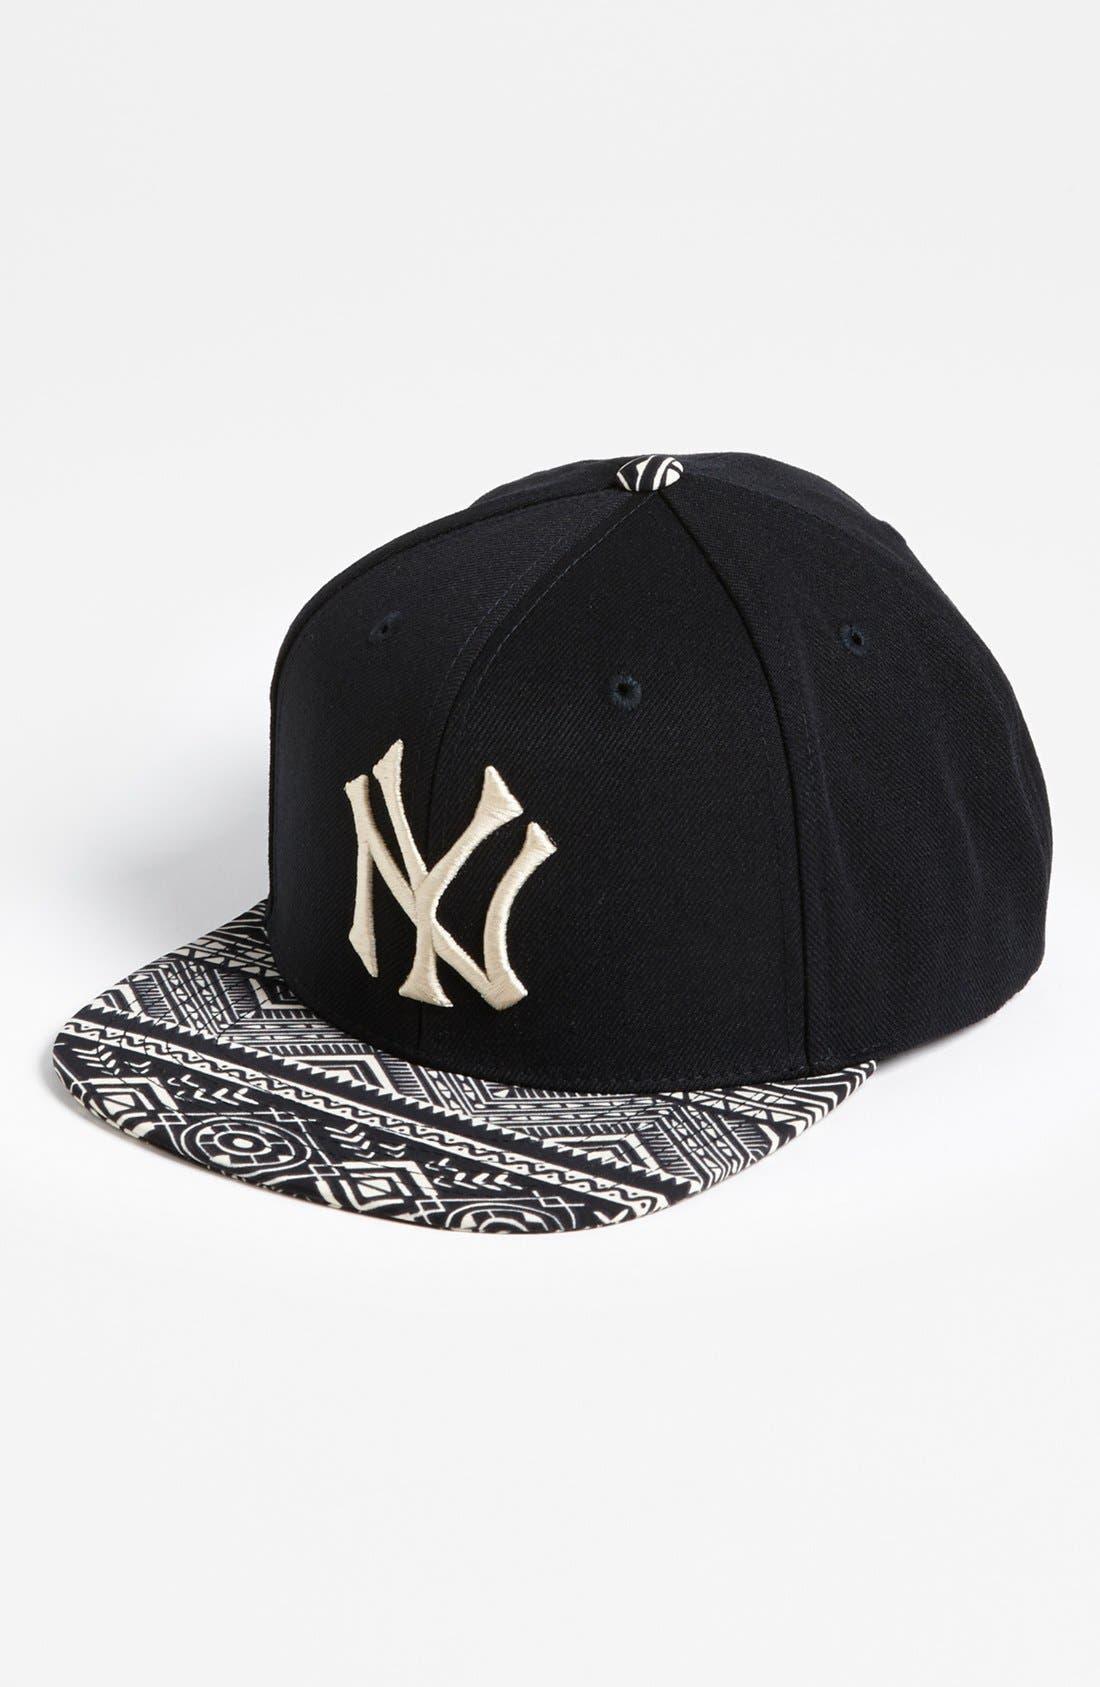 Alternate Image 1 Selected - American Needle 'New York Yankees - Ancestor' Cap